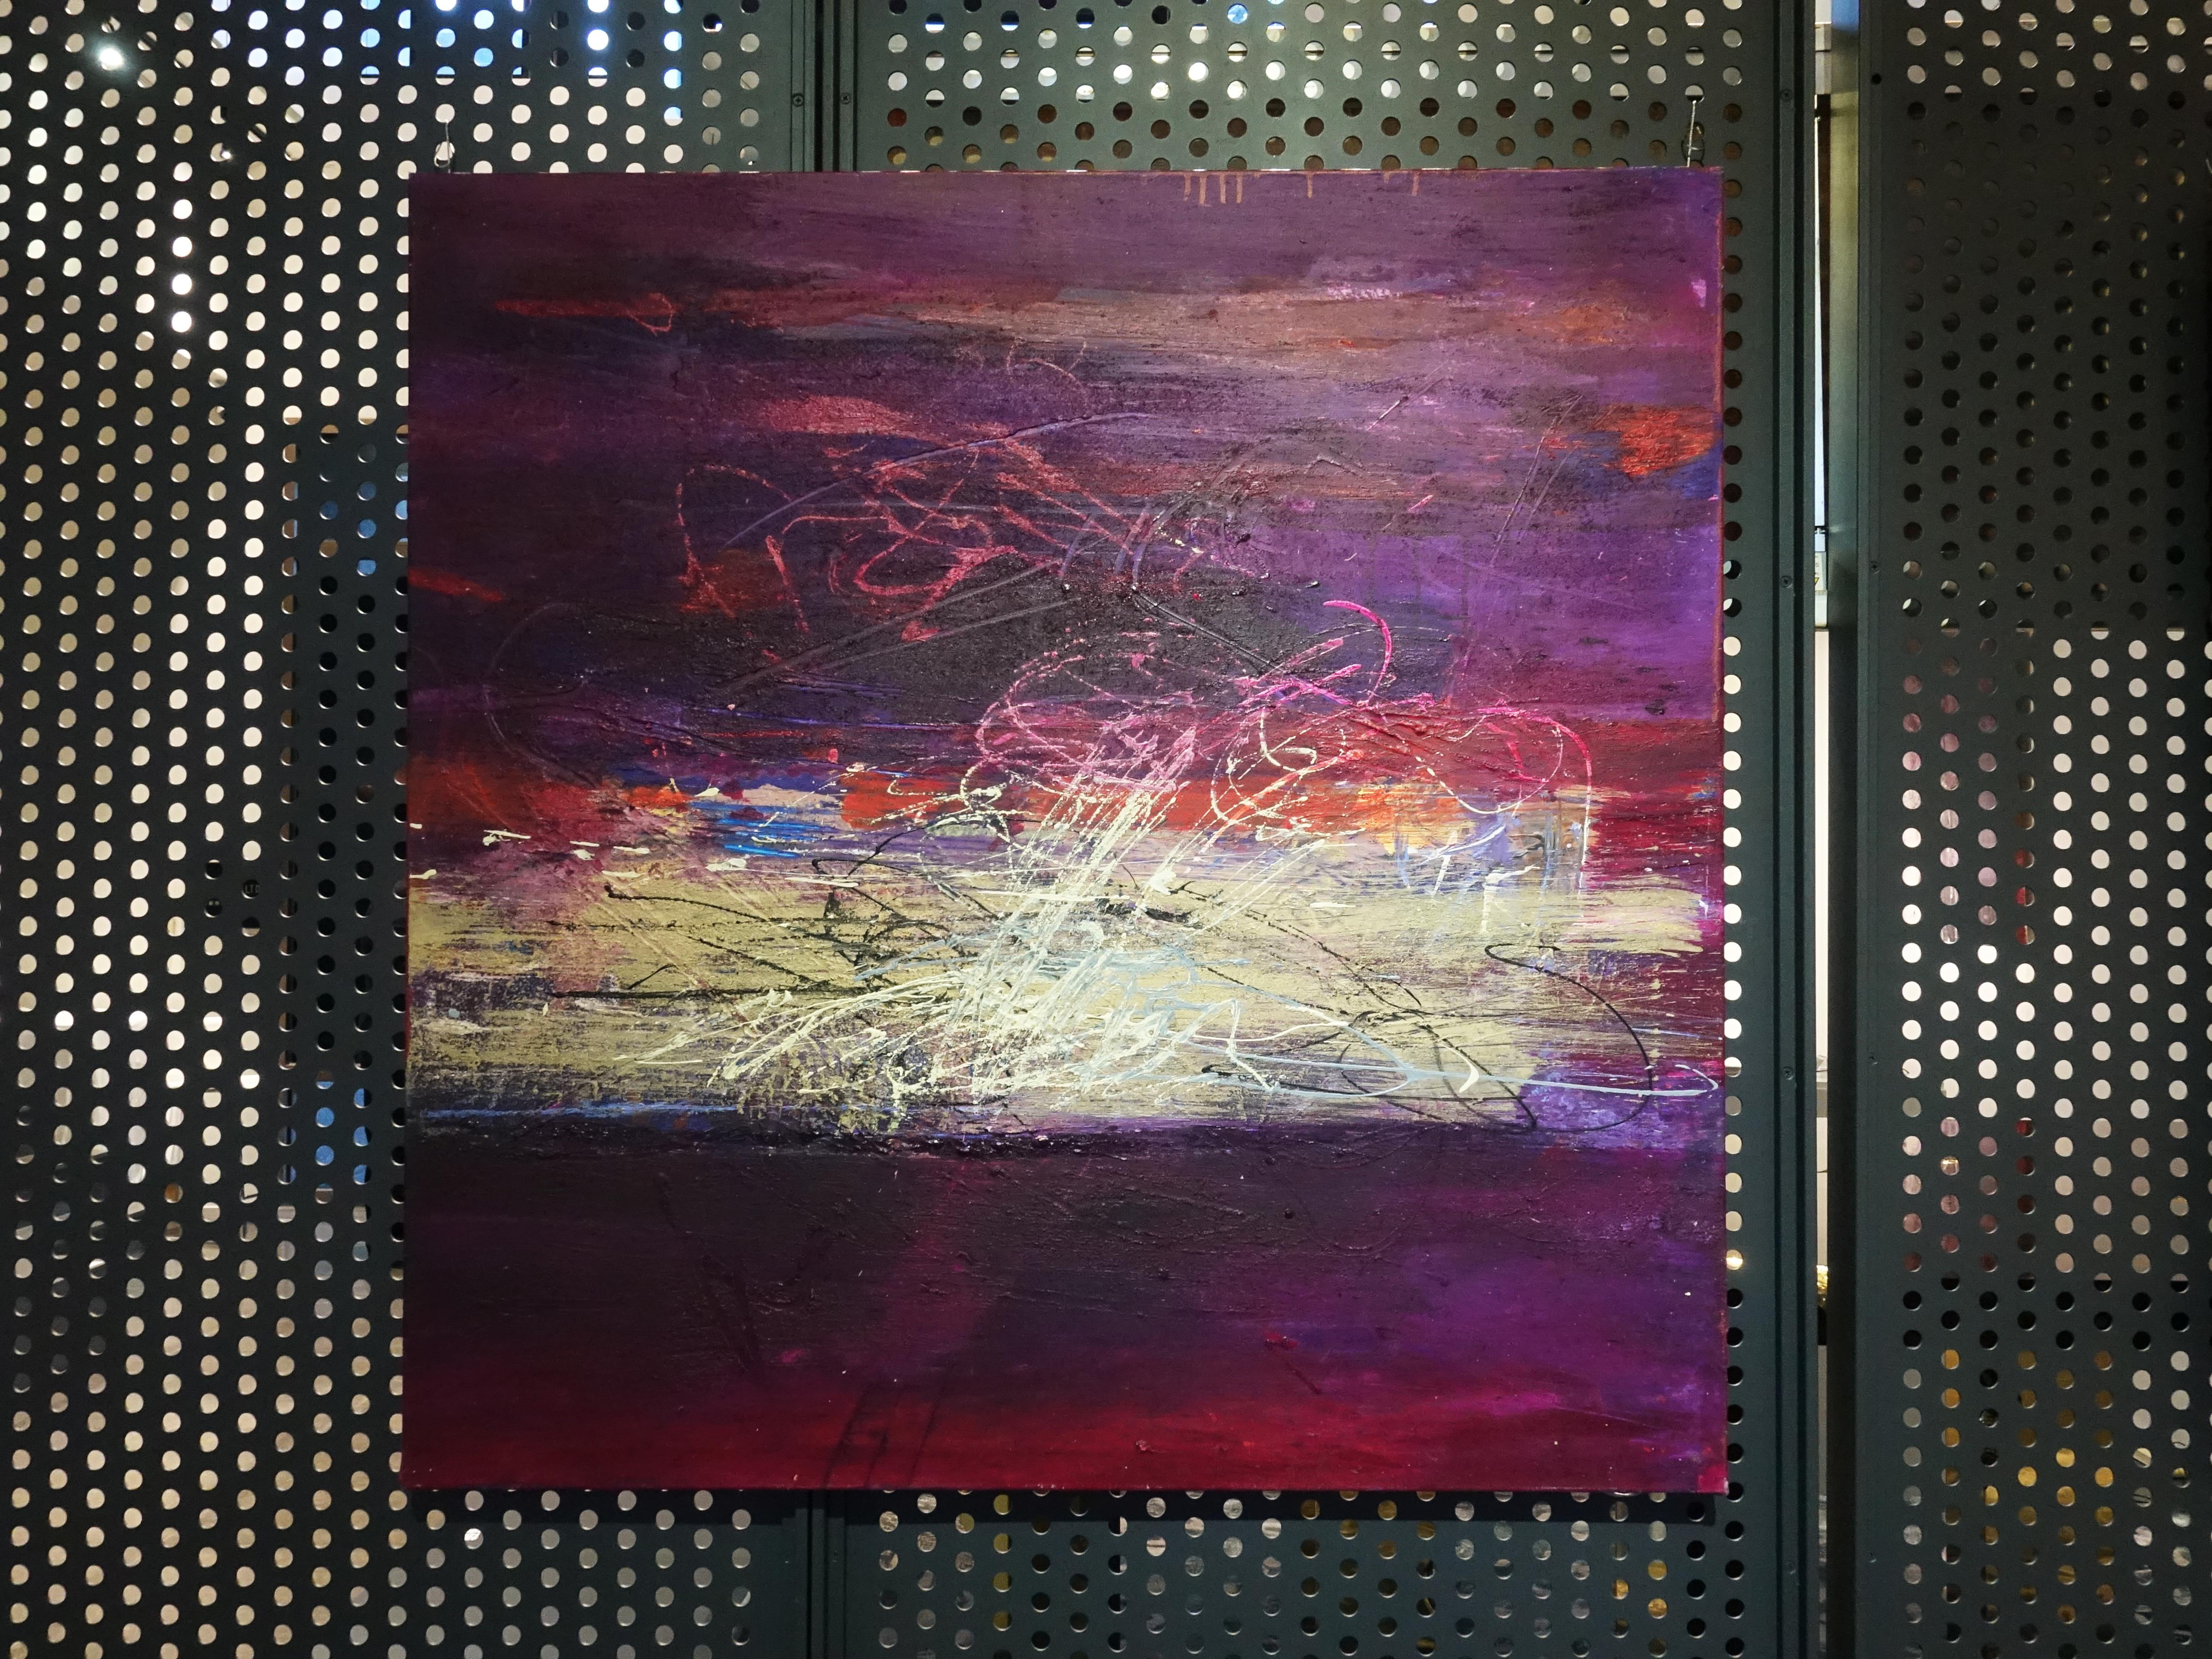 Víctor Ramírez,《Víctor Ramírez Encentro en el Horizonte II》,100x100 cm,Acrylic on Canvas,2017。